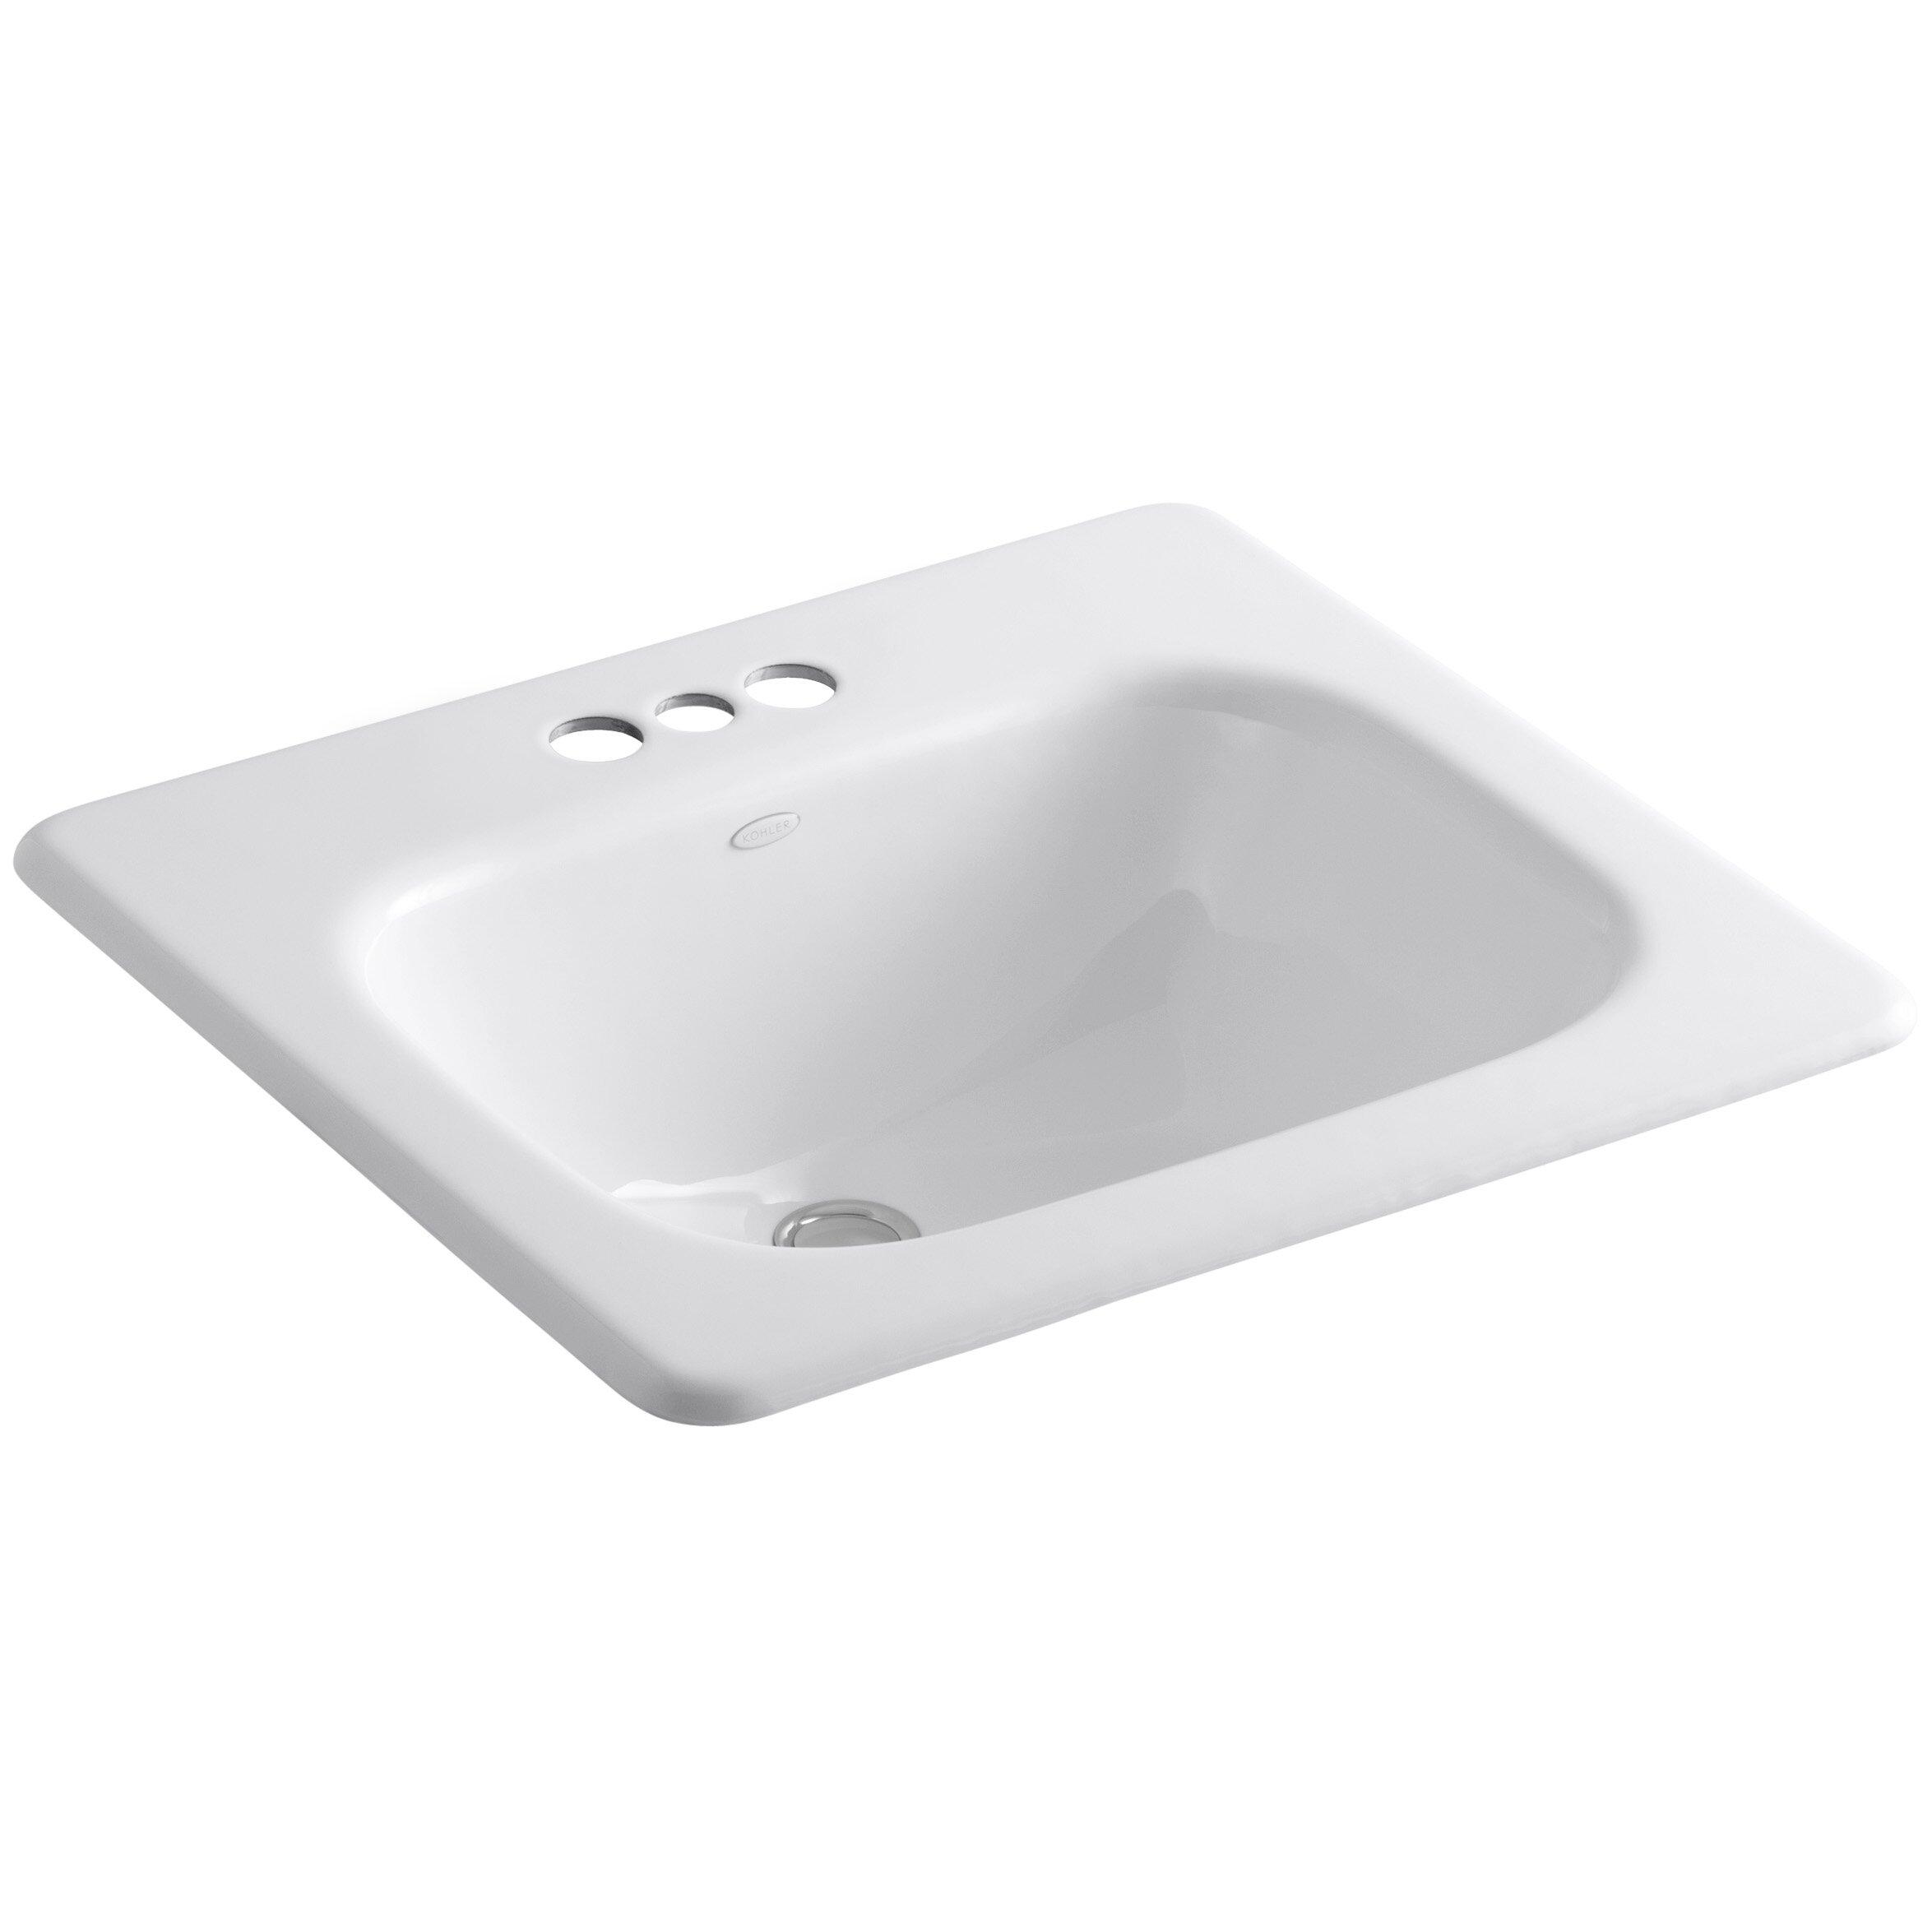 "Kohler Tahoe Drop In Bathroom Sink with 4"" Centerset"